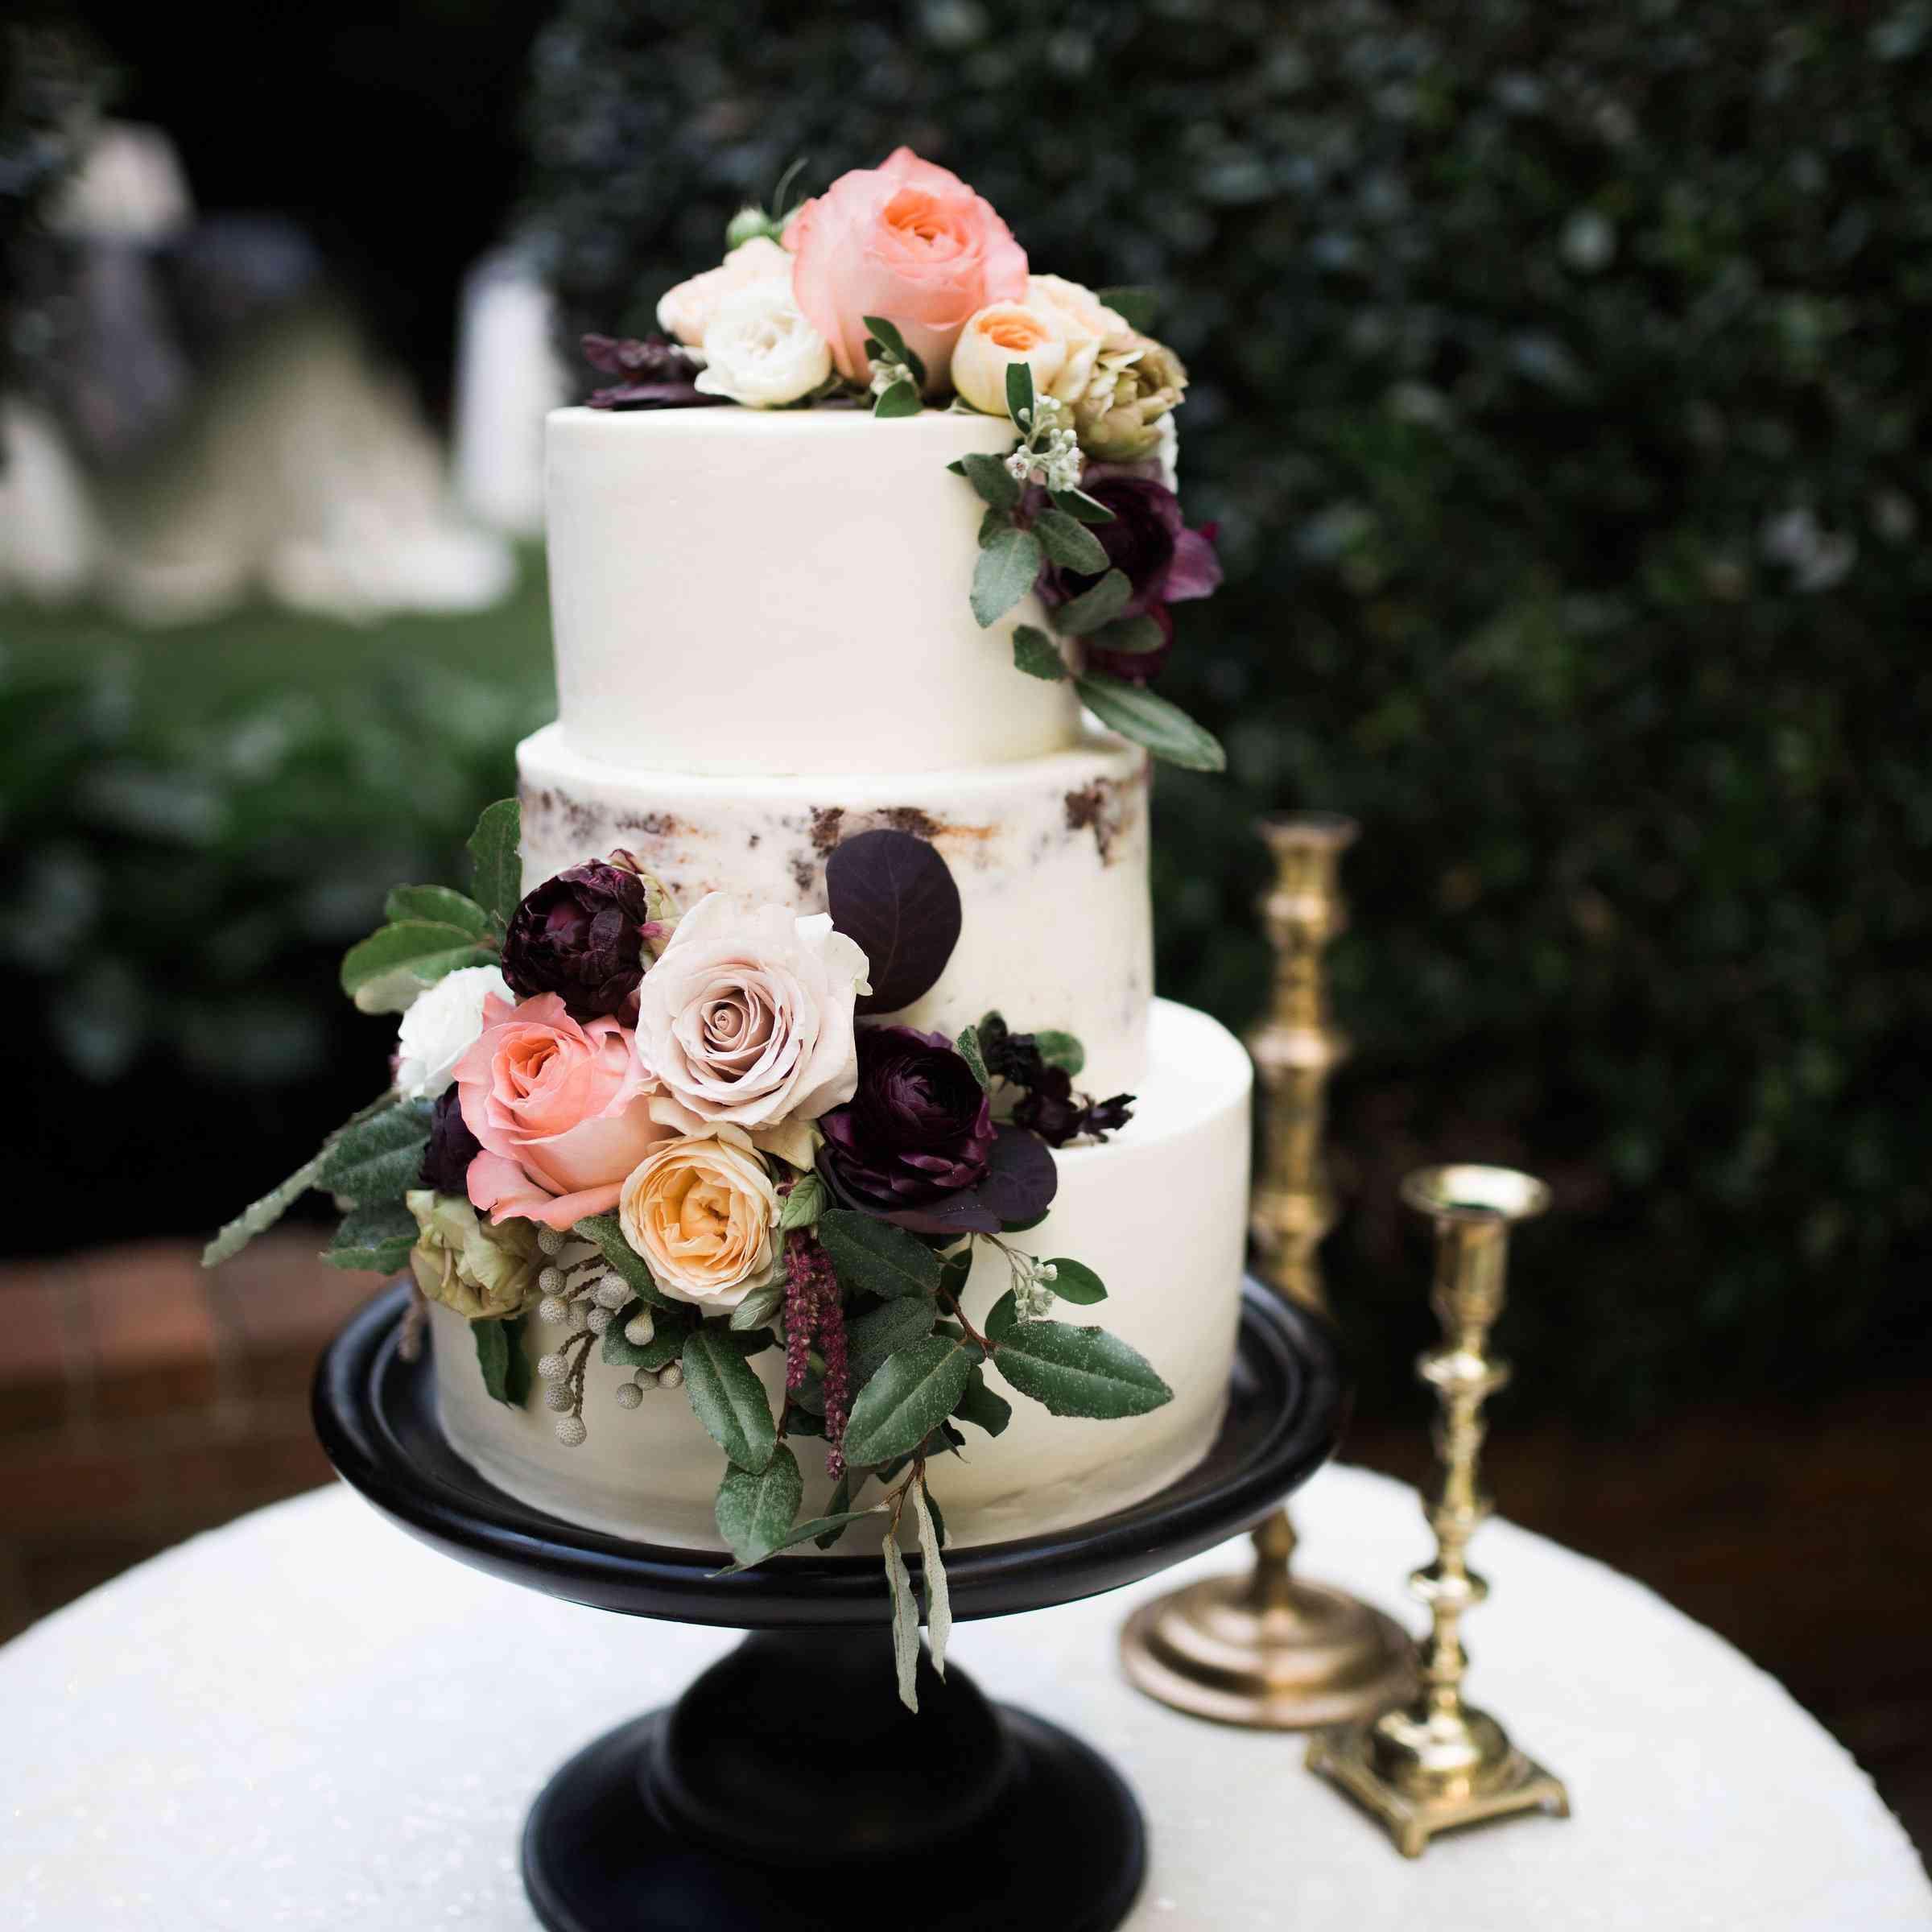 Романтическая свадьба в стиле love is